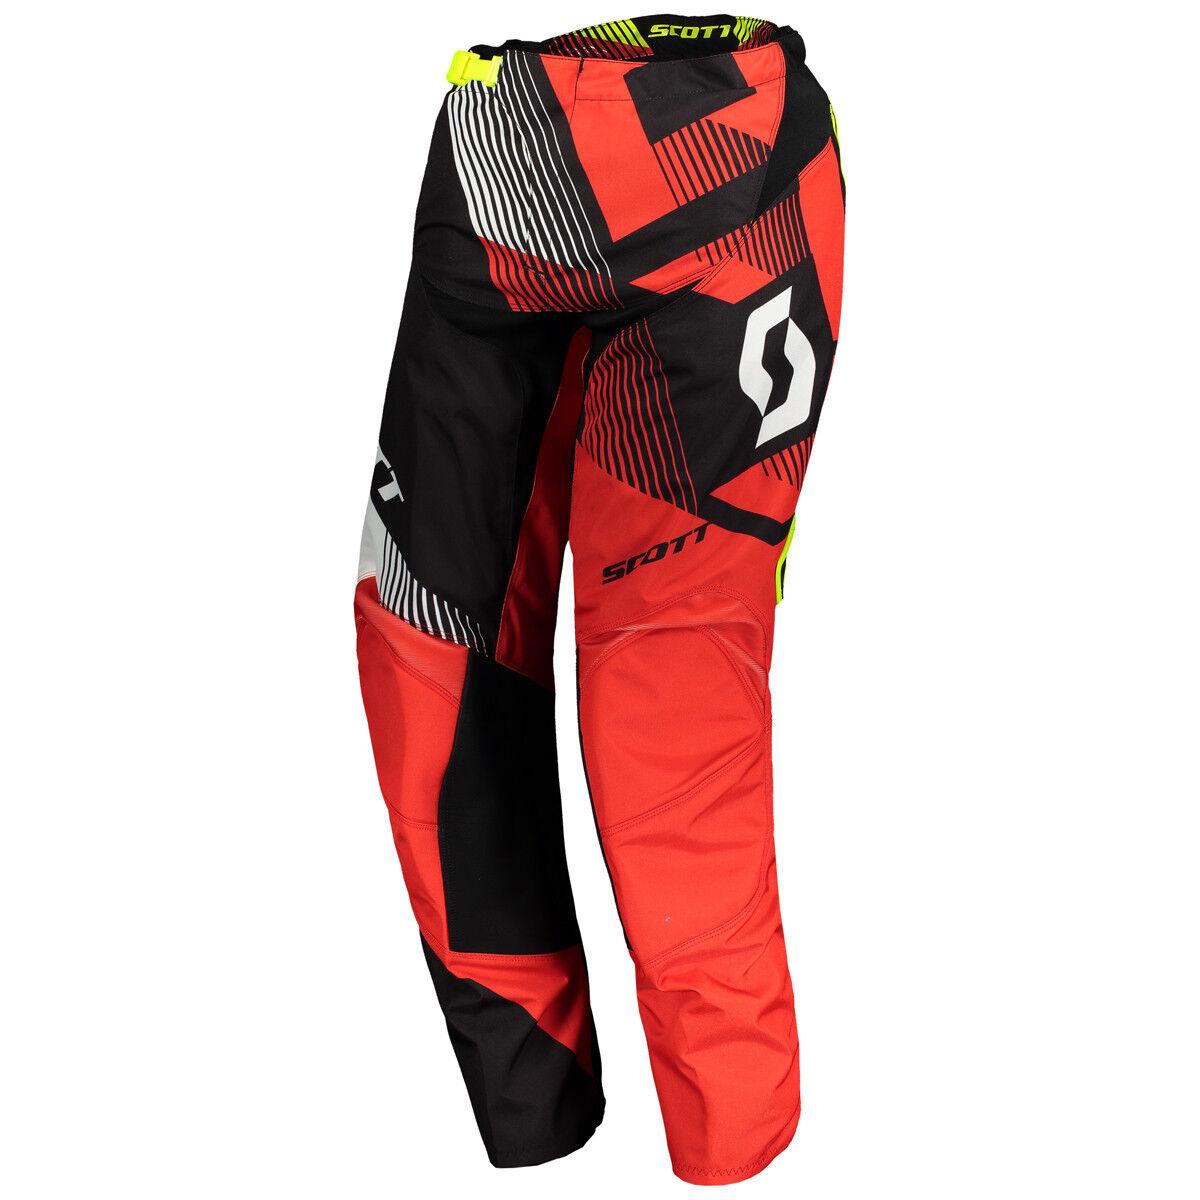 Scott 350  Dirt MX motocross dh bicicleta pantalones rojo negro 2018